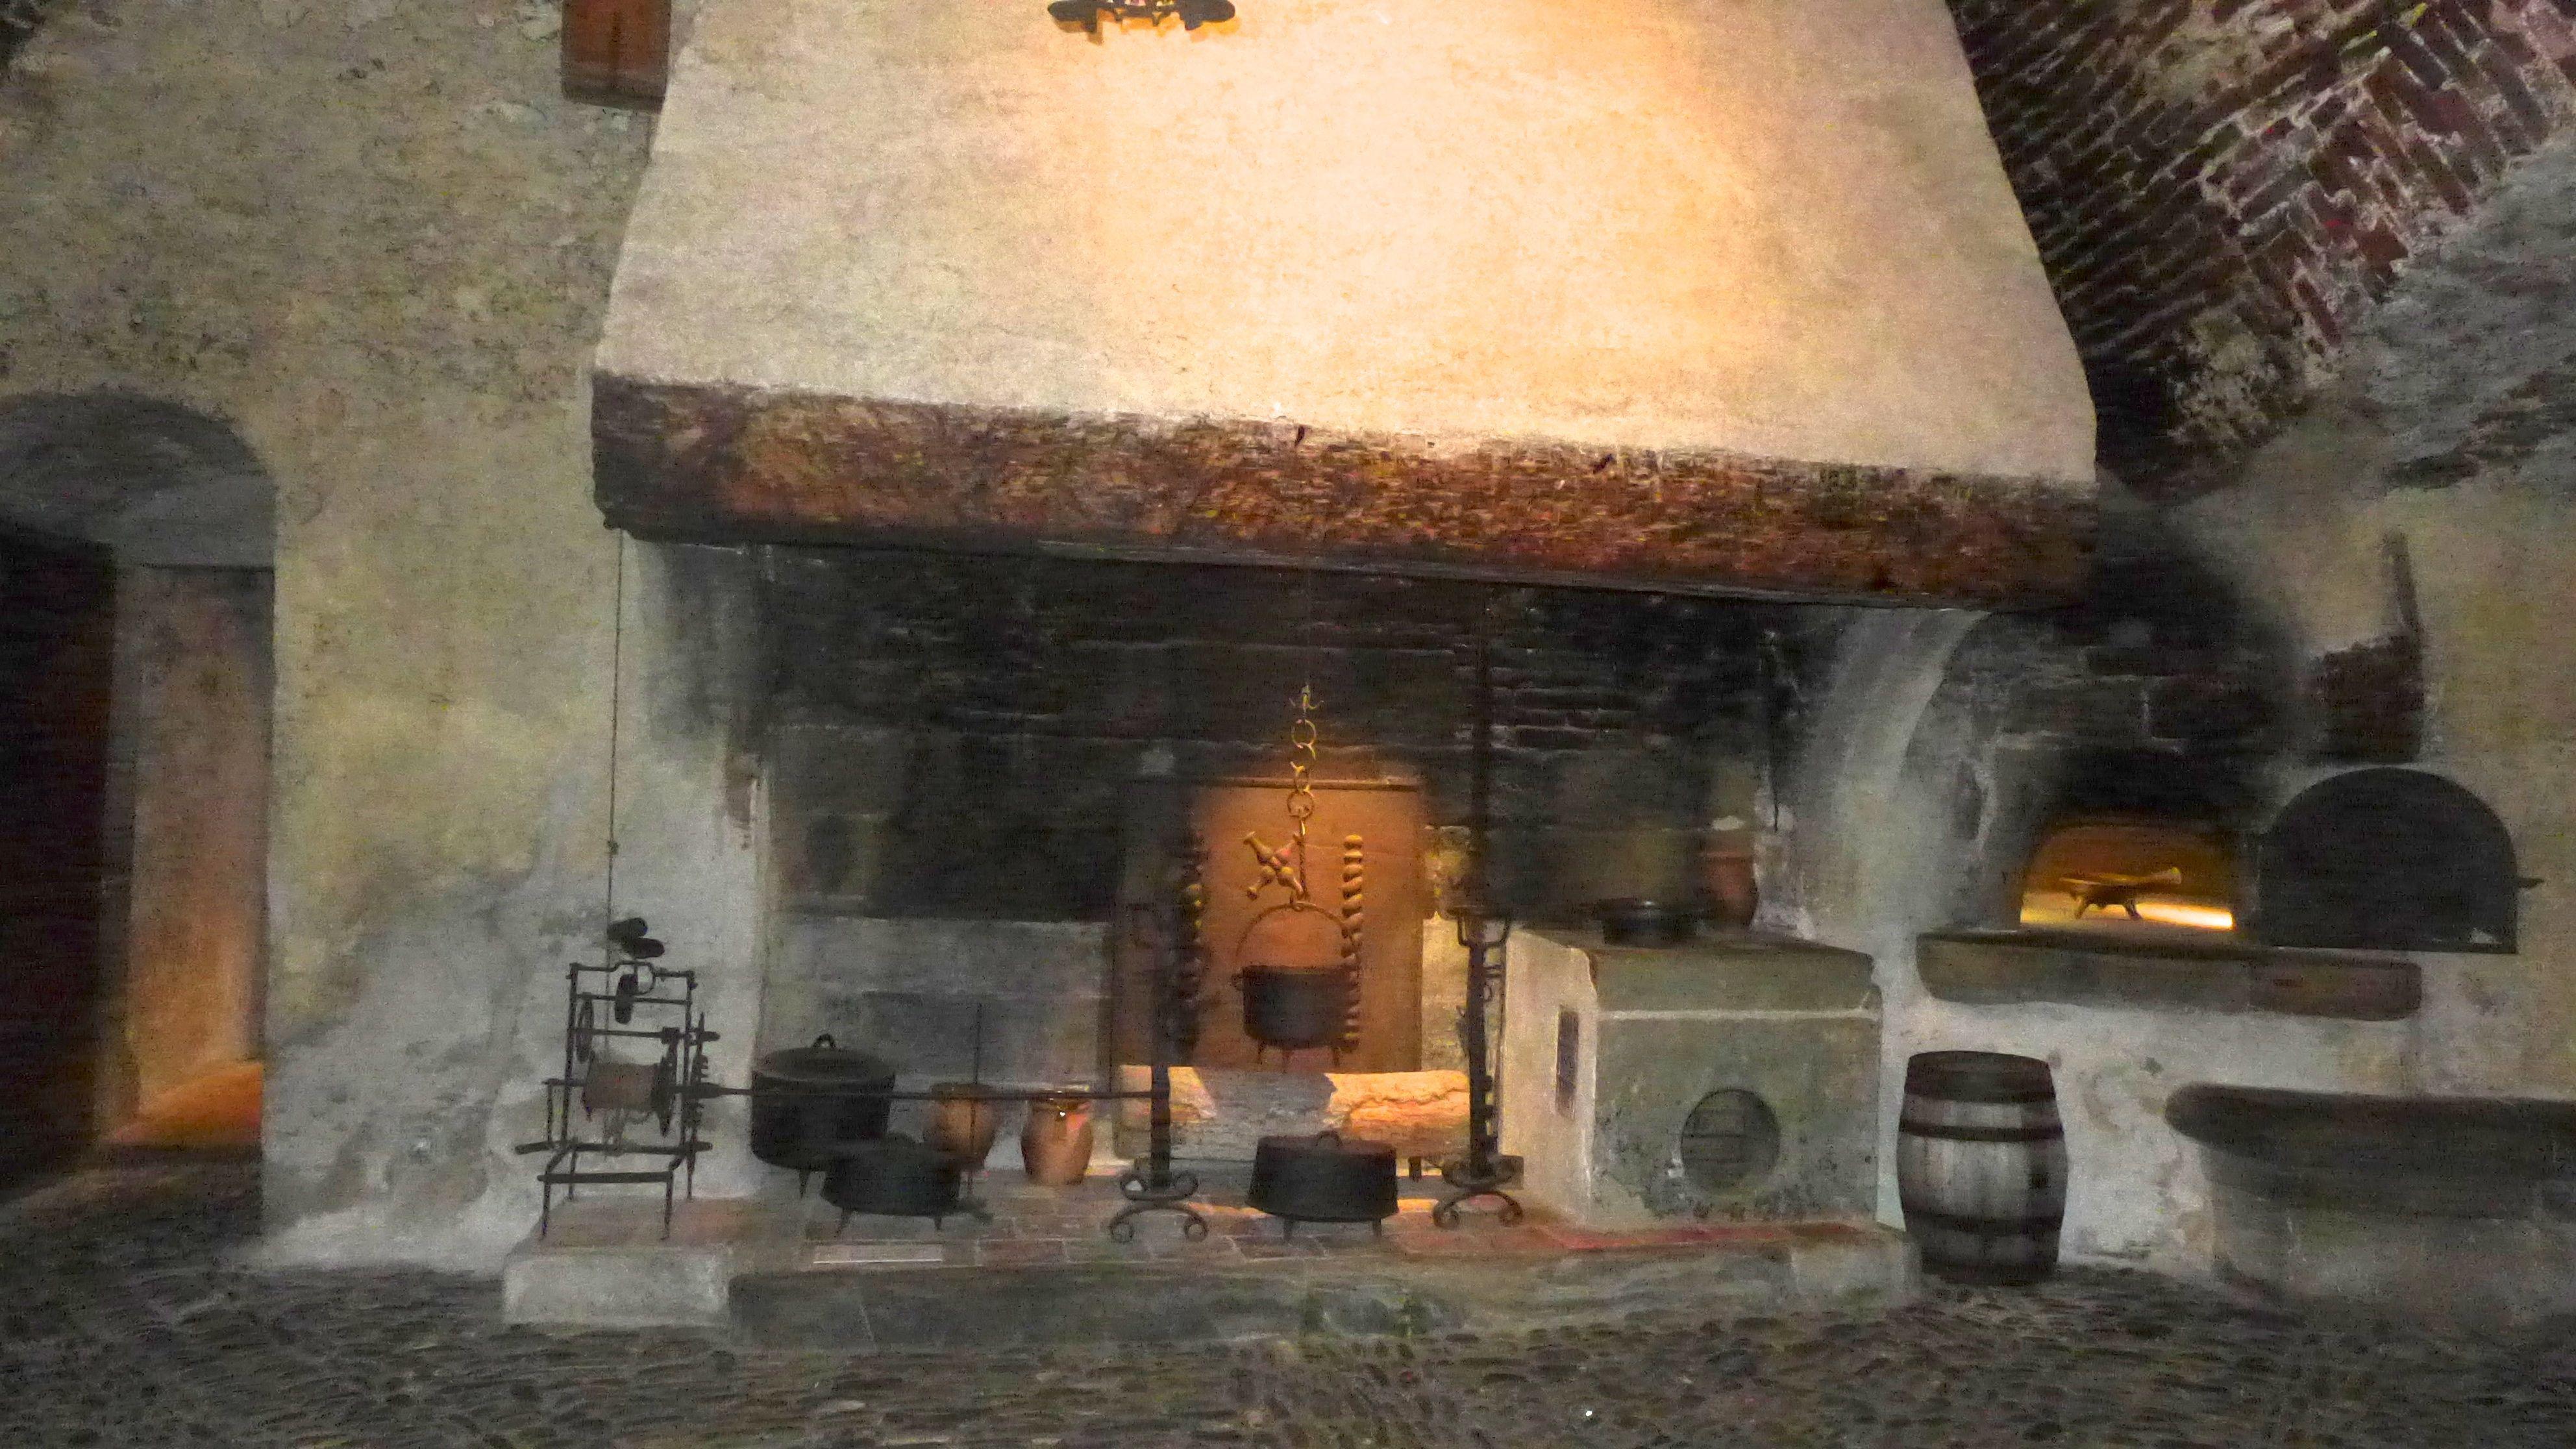 Gruy res lac ville et ch teau for Cheminee cuisine ancienne